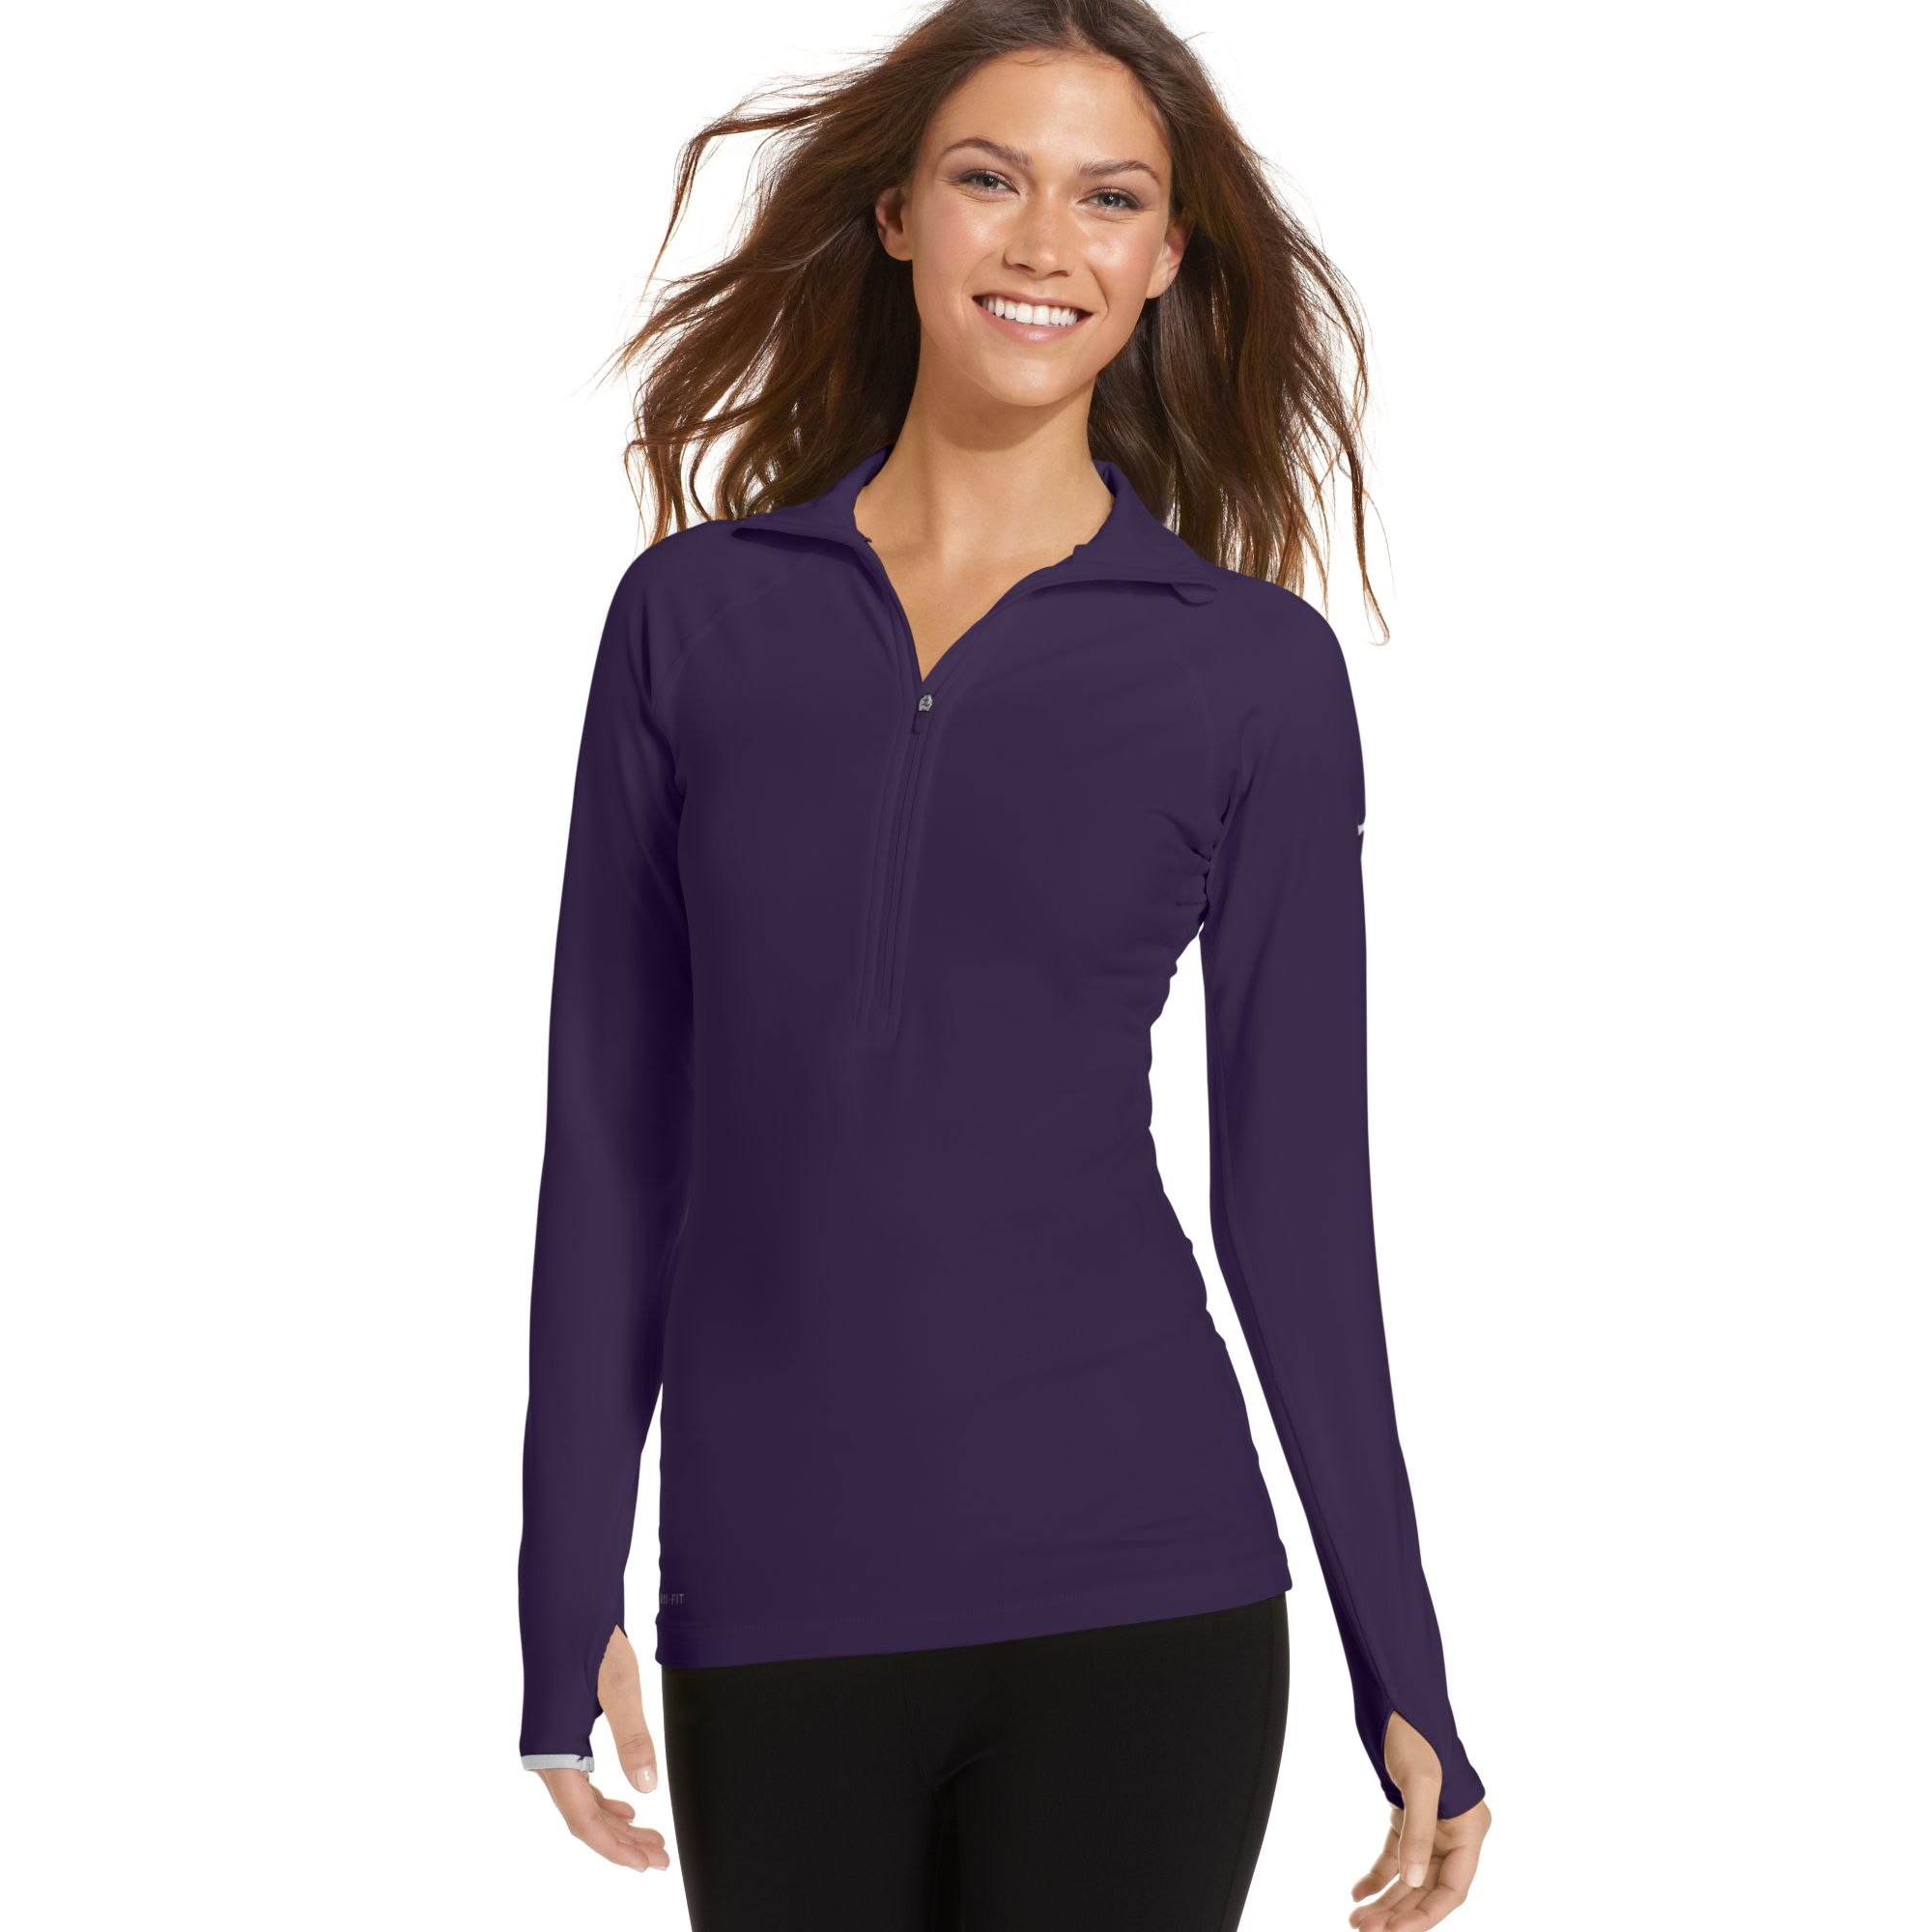 cbc238951 Nike Womens Pro Hyperwarm Long Sleeve Shirt - DREAMWORKS